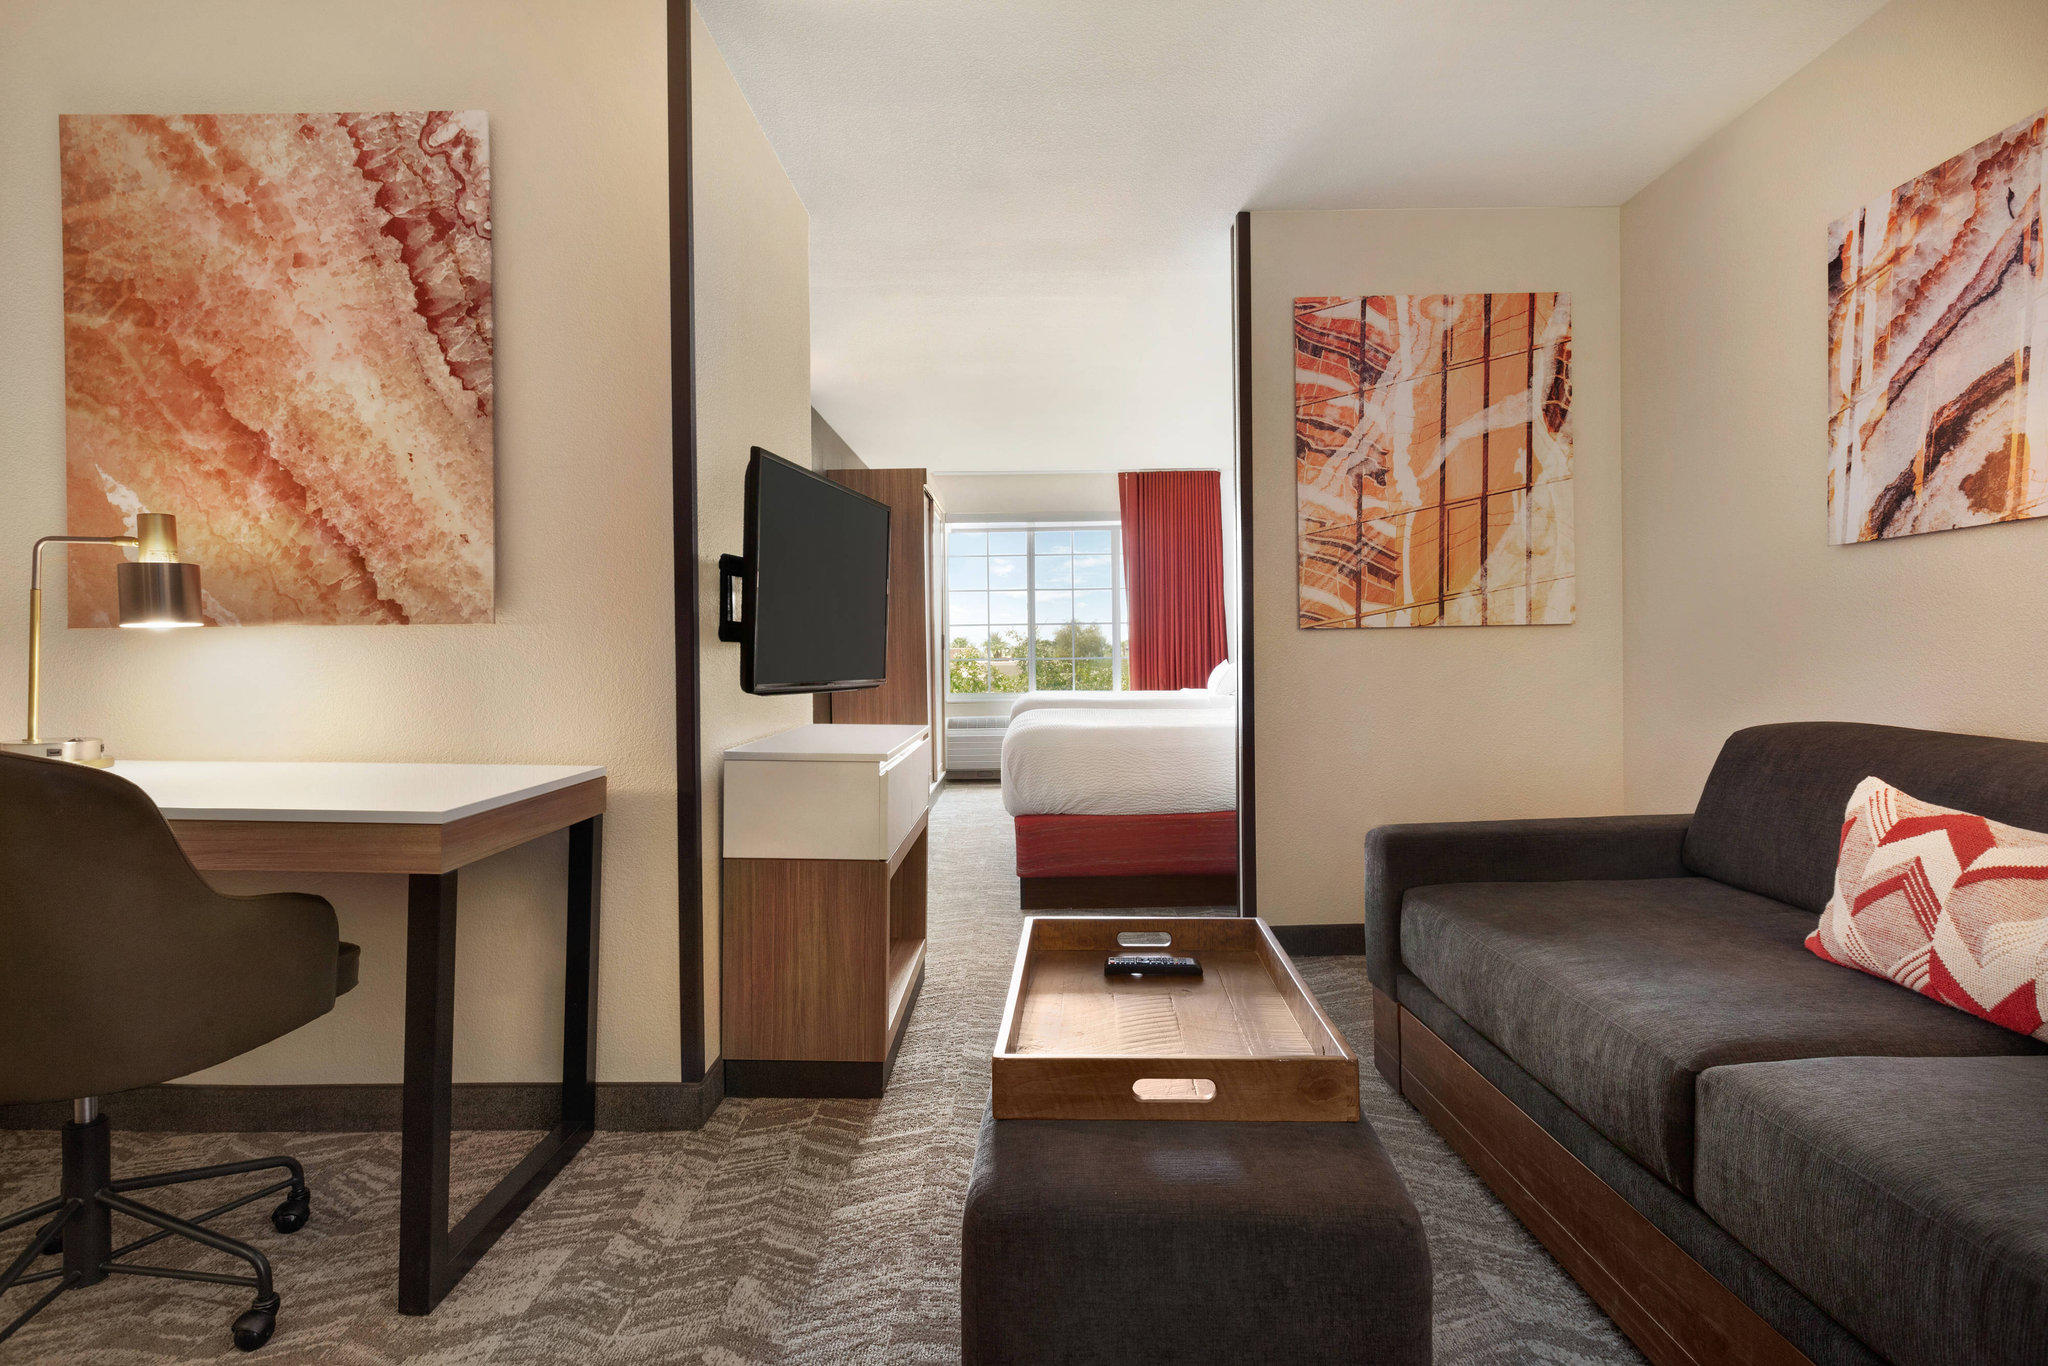 SpringHill Suites by Marriott Phoenix Chandler/Fashion Center